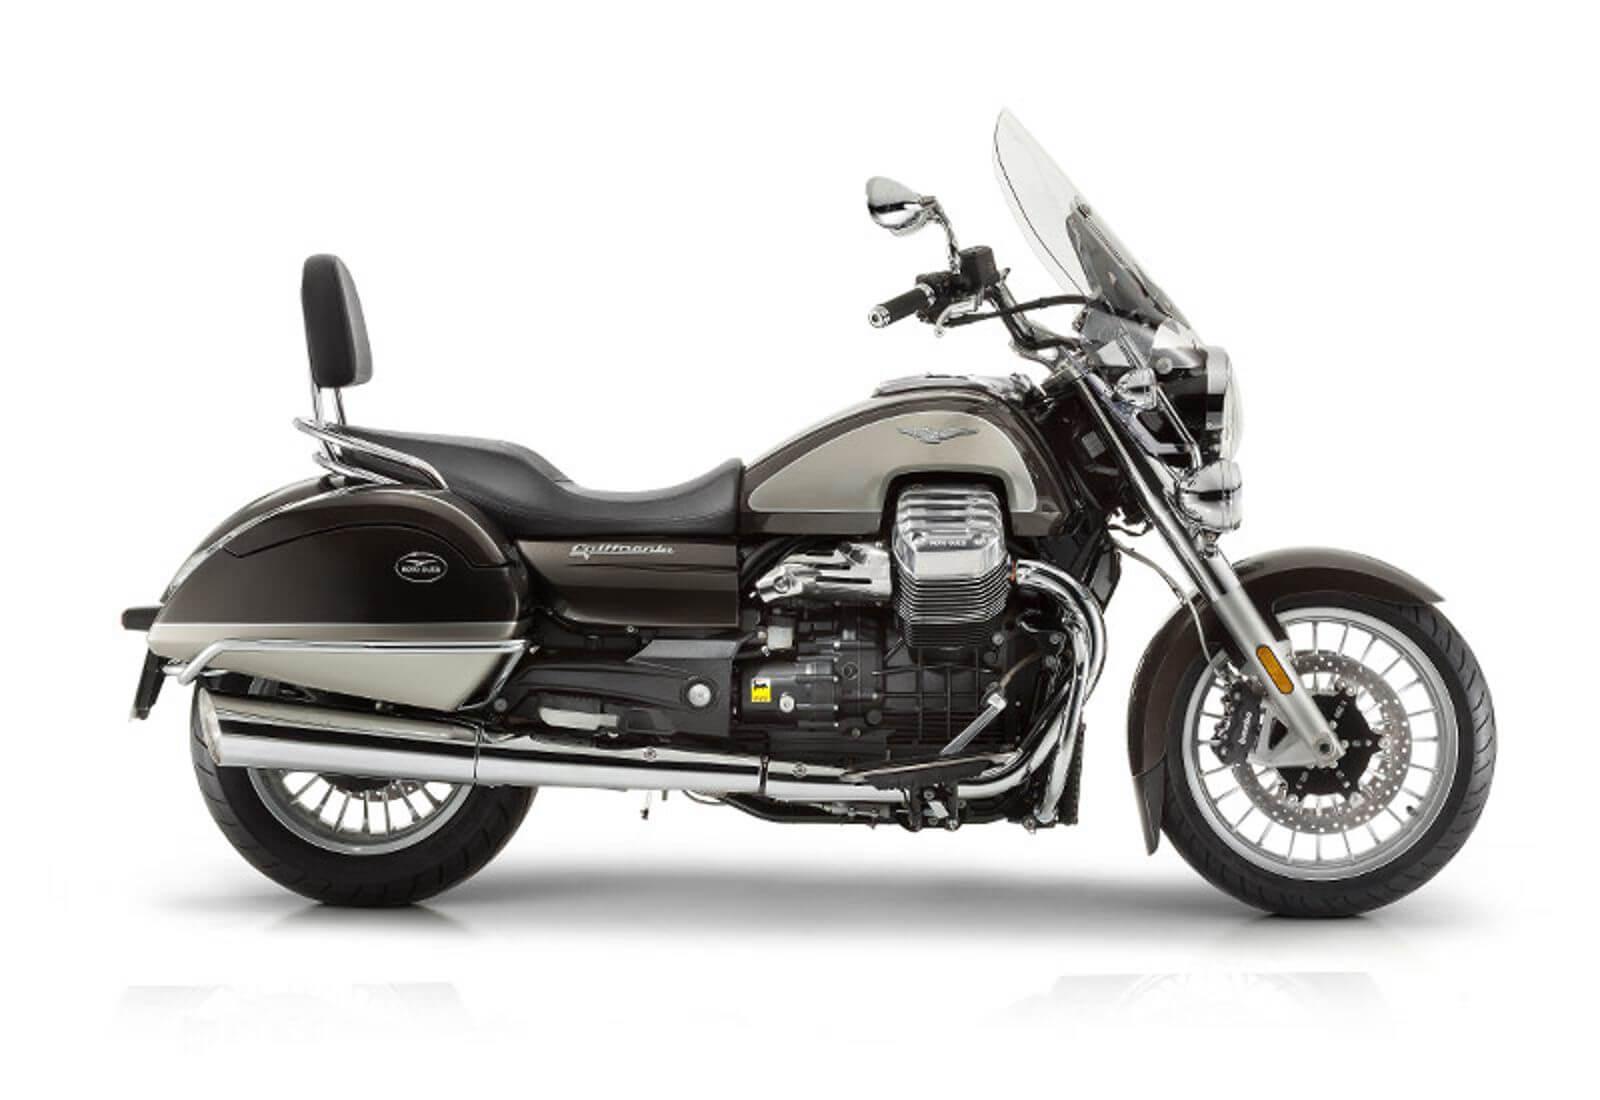 Moto Guzzi California 1400 SE